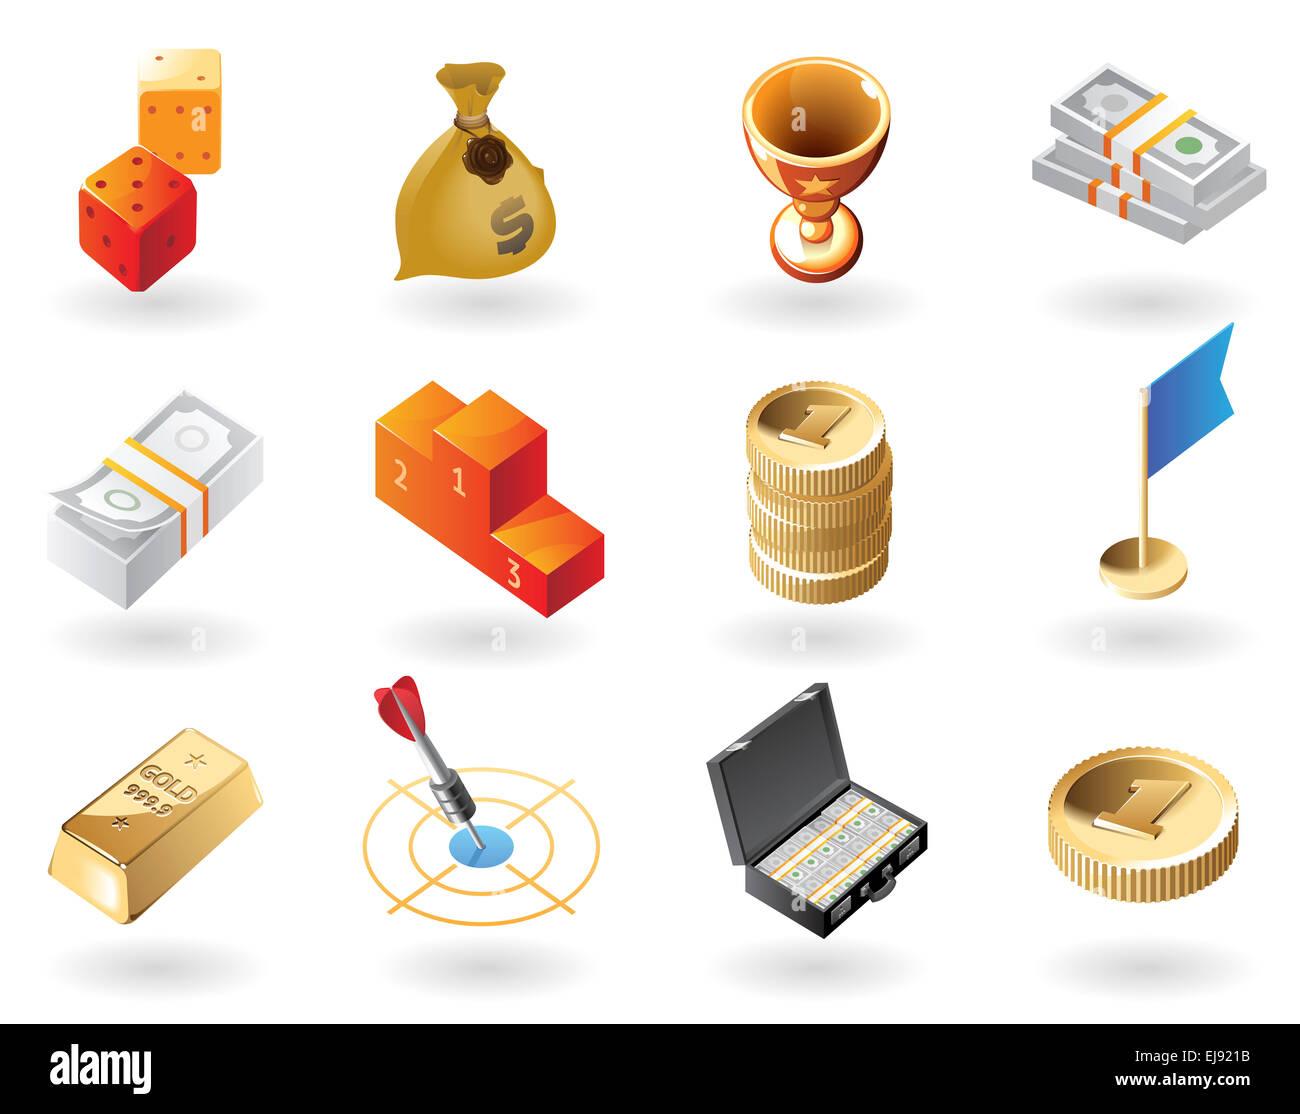 Isometric-style icons for awards - Stock Image